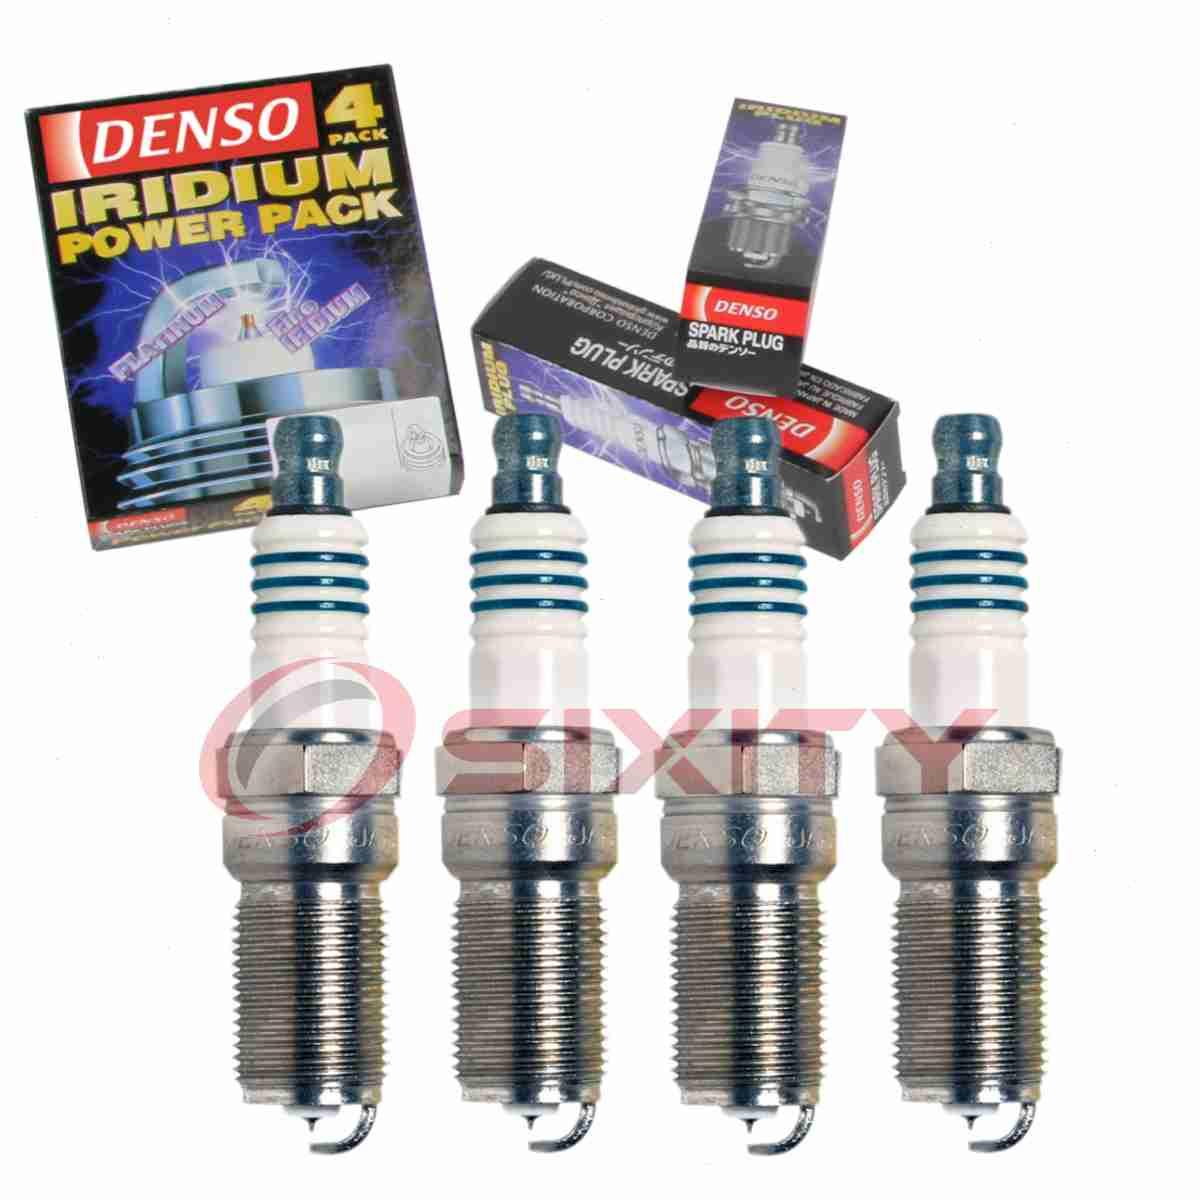 4 pc Denso Iridium Power Spark Plugs for Ford Taurus 2.0L L4 2013-2016 Tune gv